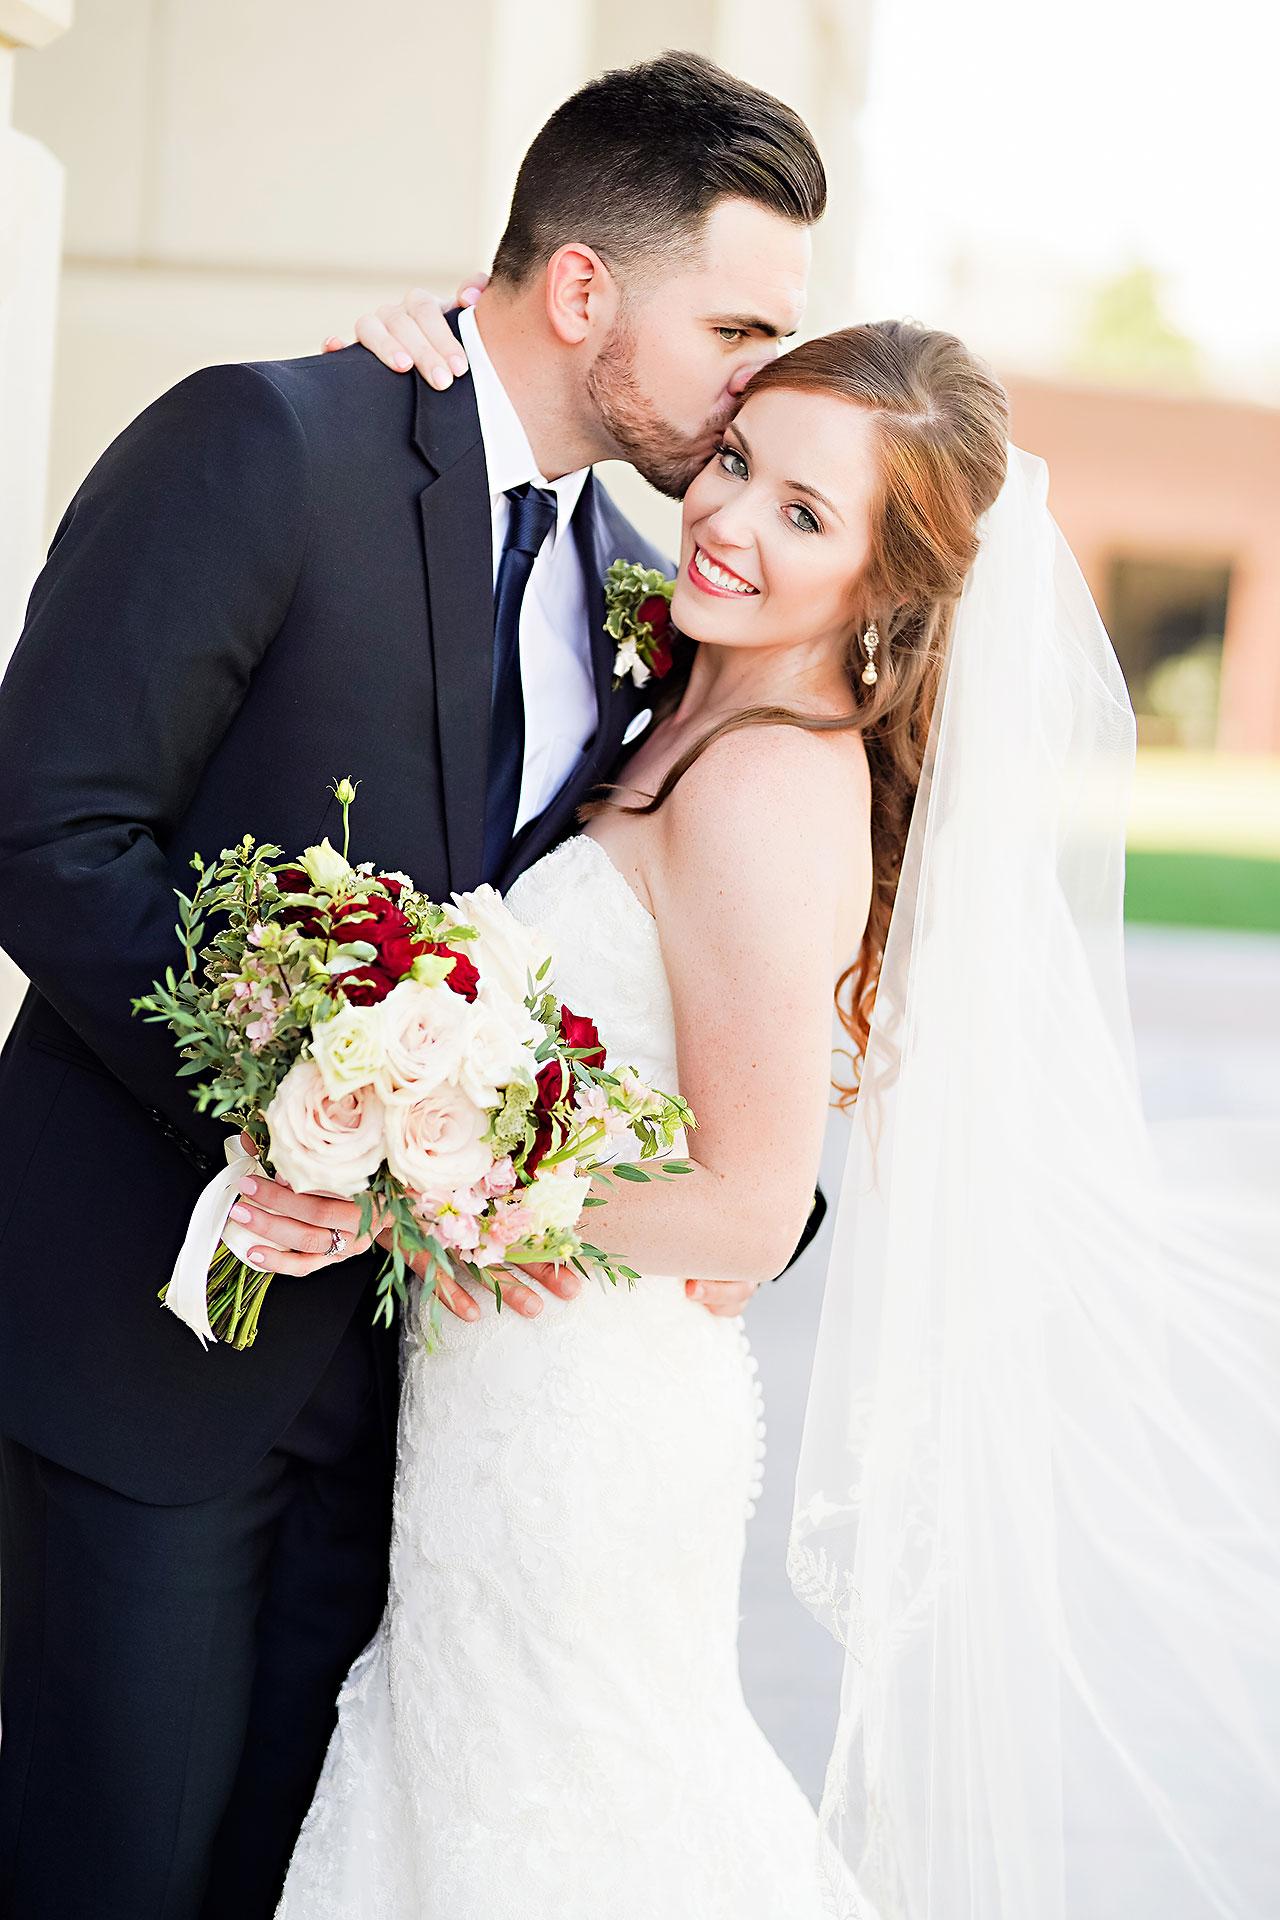 Callie Josh Ritz Charles Garden Pavilion Carmel Indiana Wedding 134